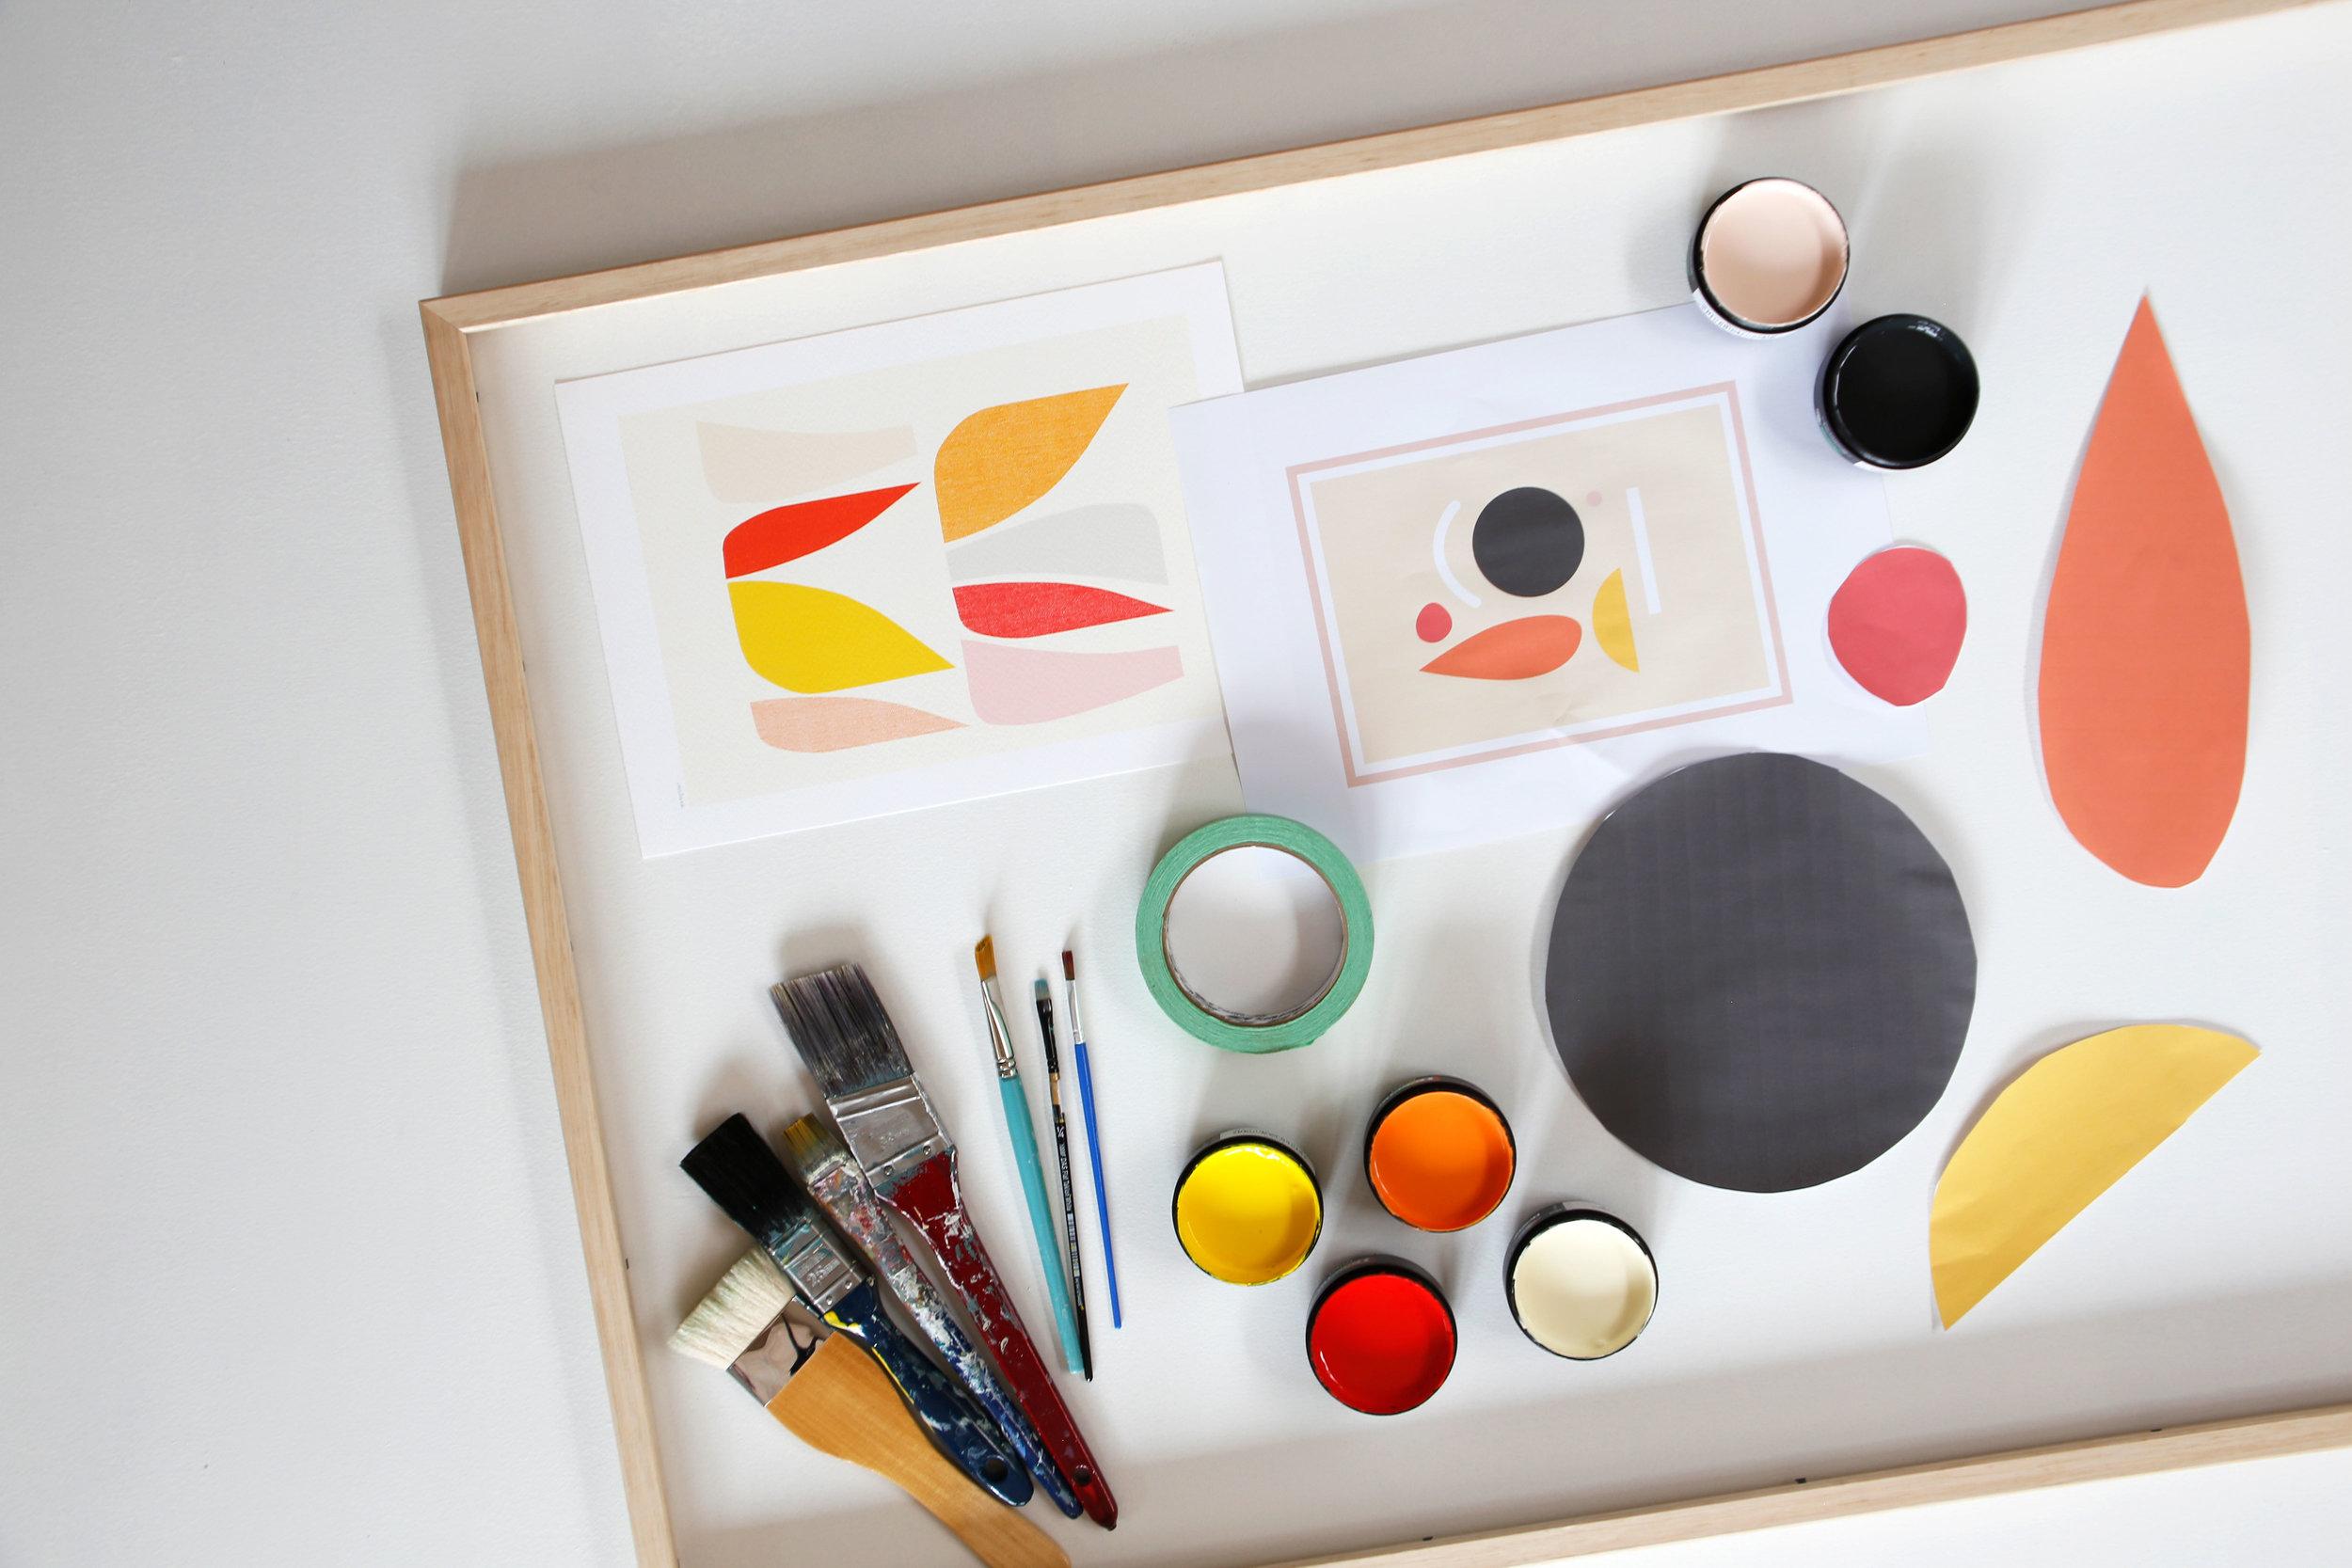 Resene-AbstractArt-DIY-tools.jpg